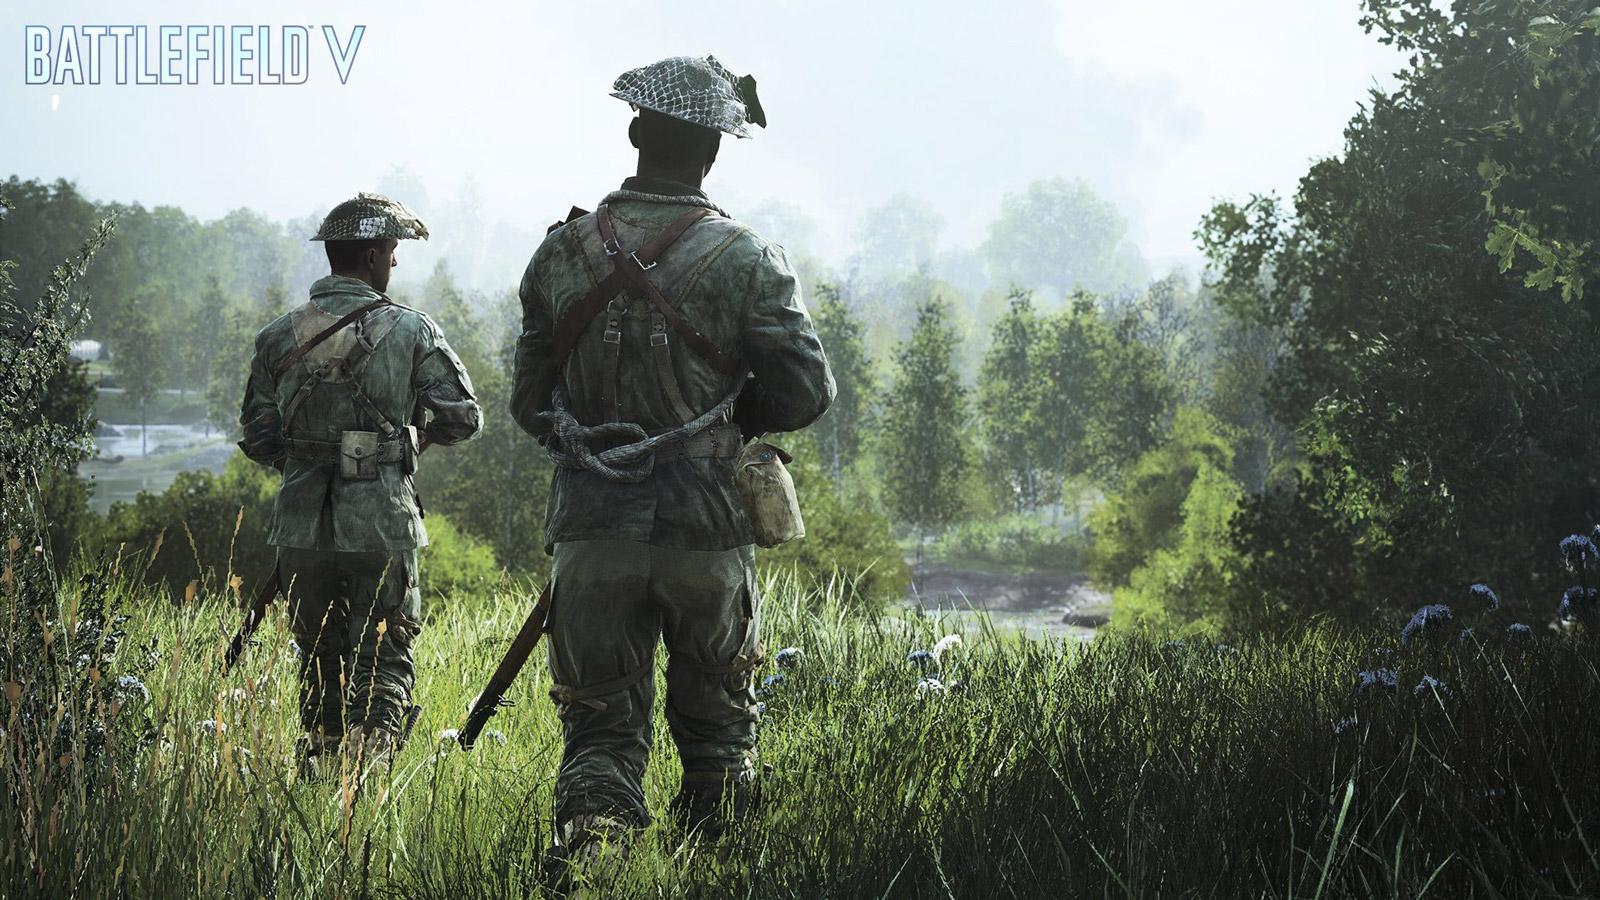 Free Battlefield V Wallpaper in 1600x900